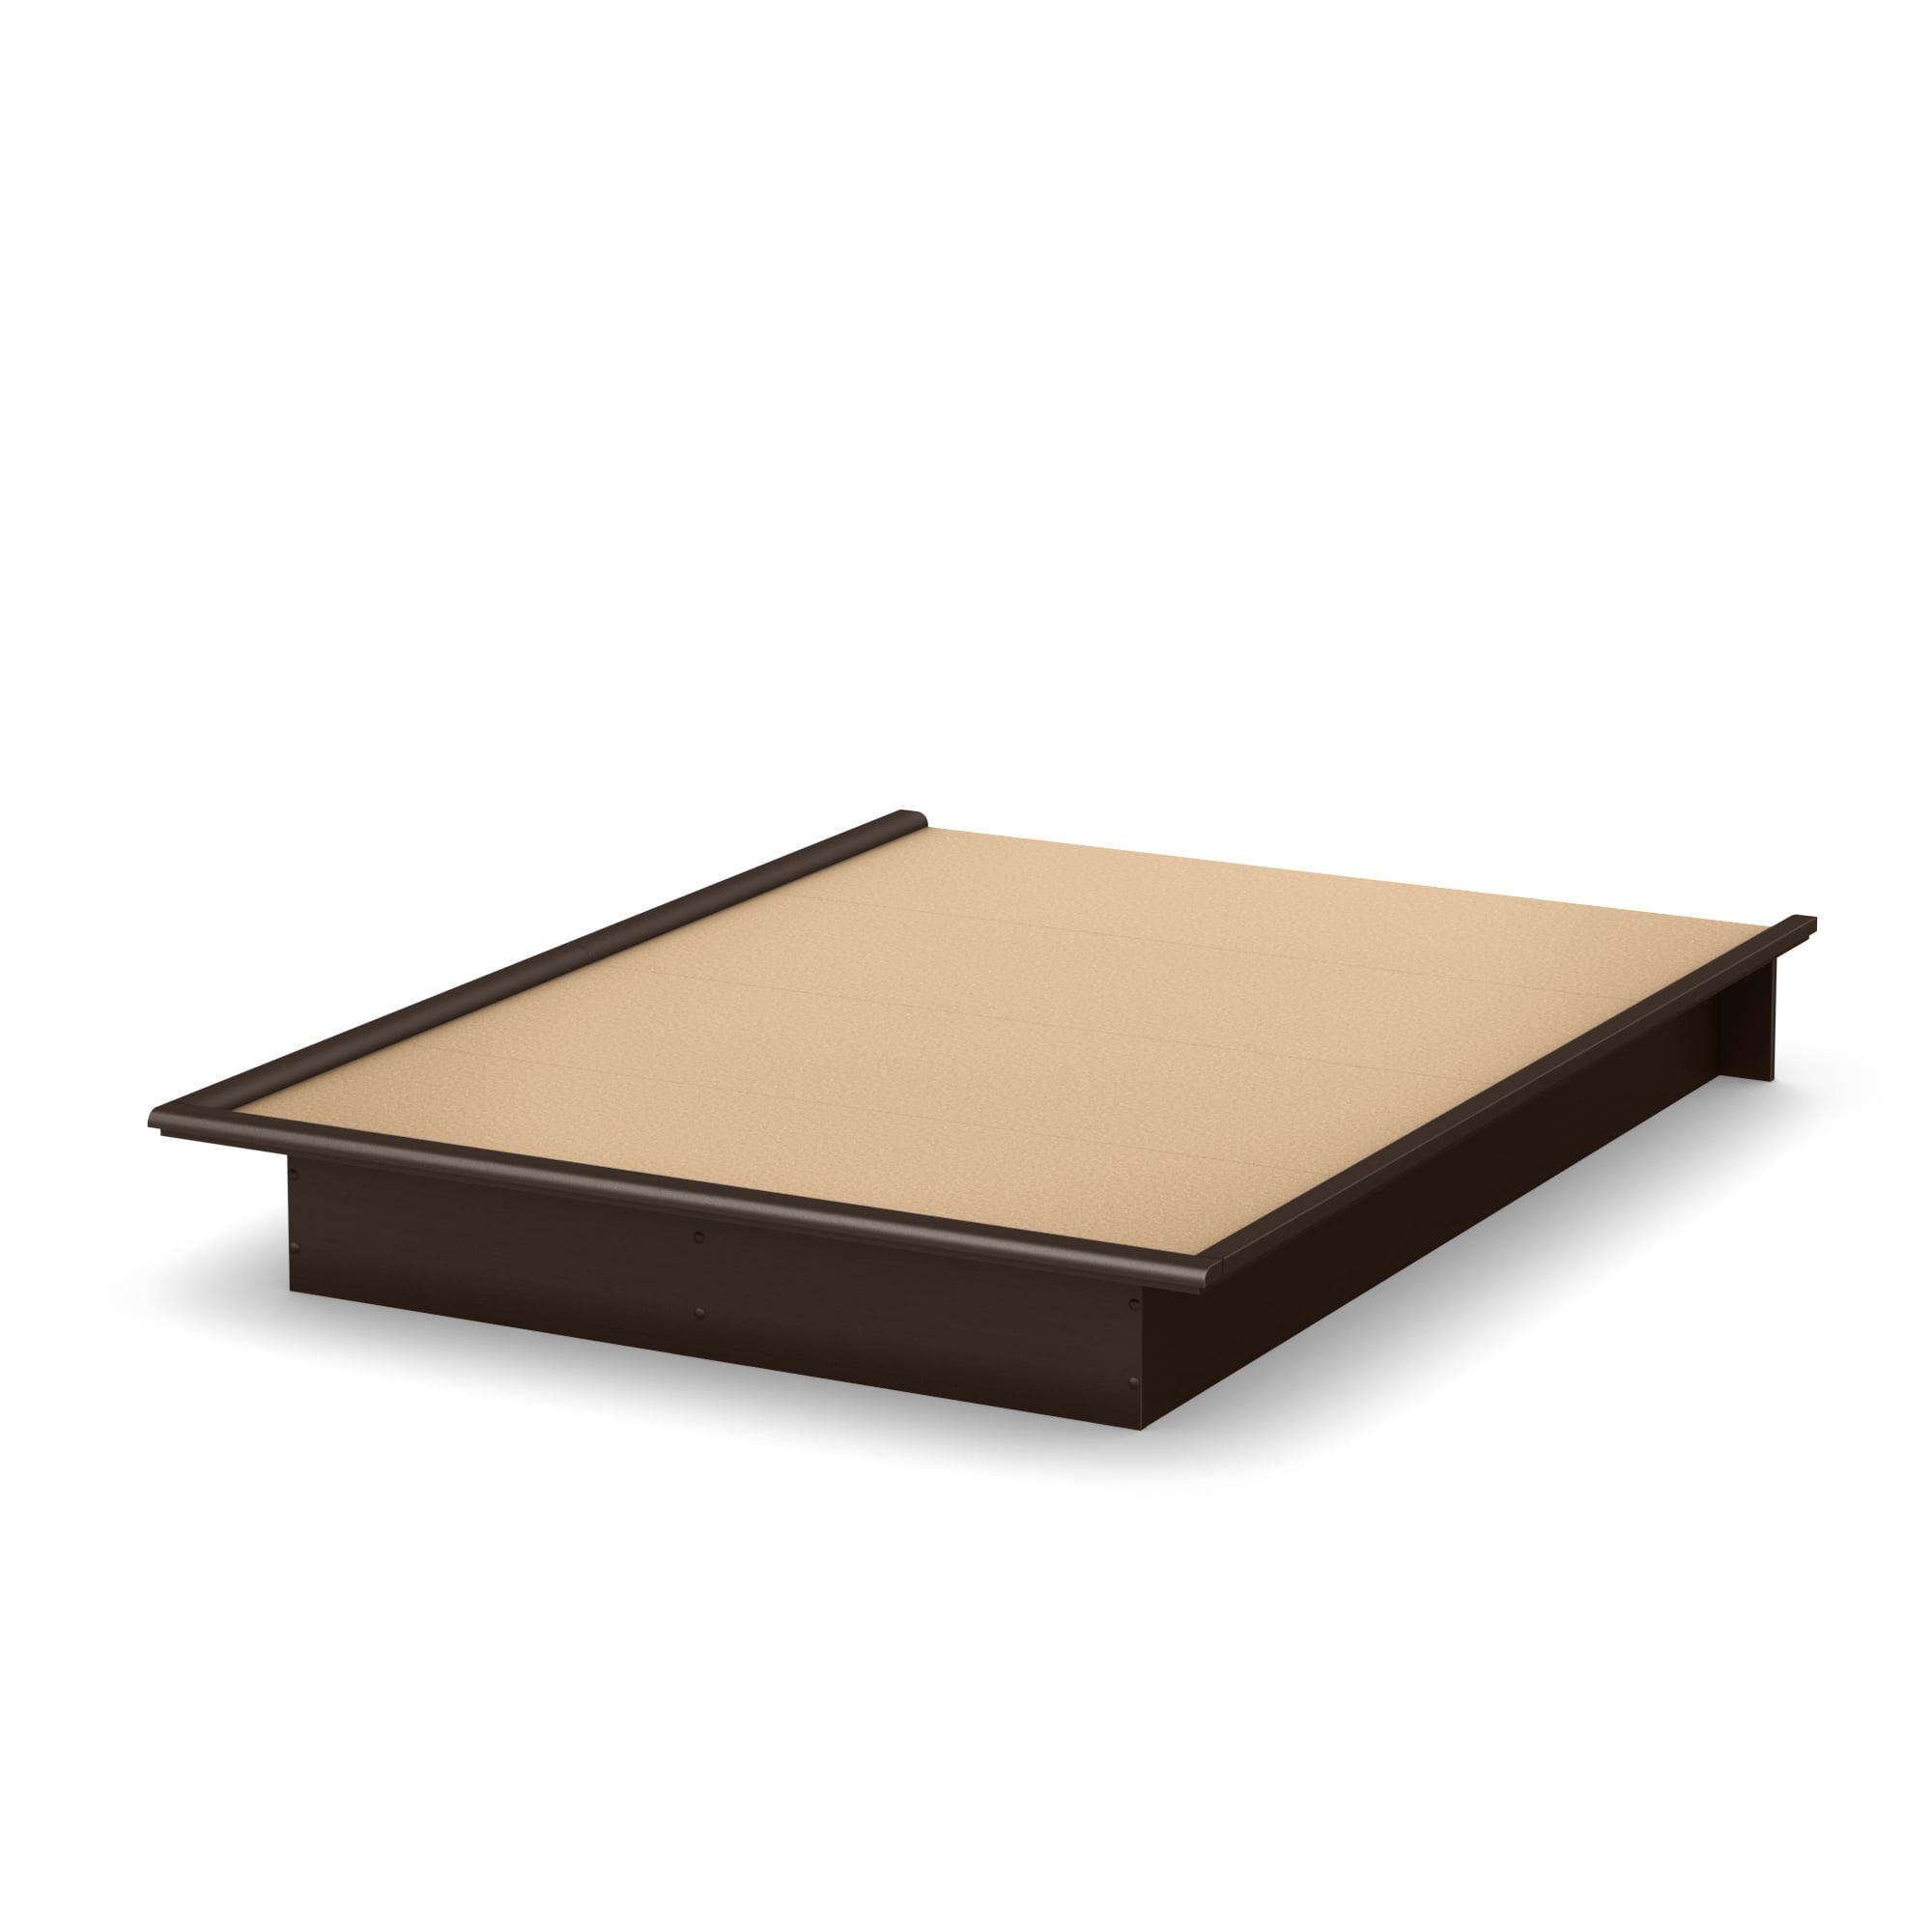 "South Shore Basics 54"" Full Size Platform Bed with Molding ..."